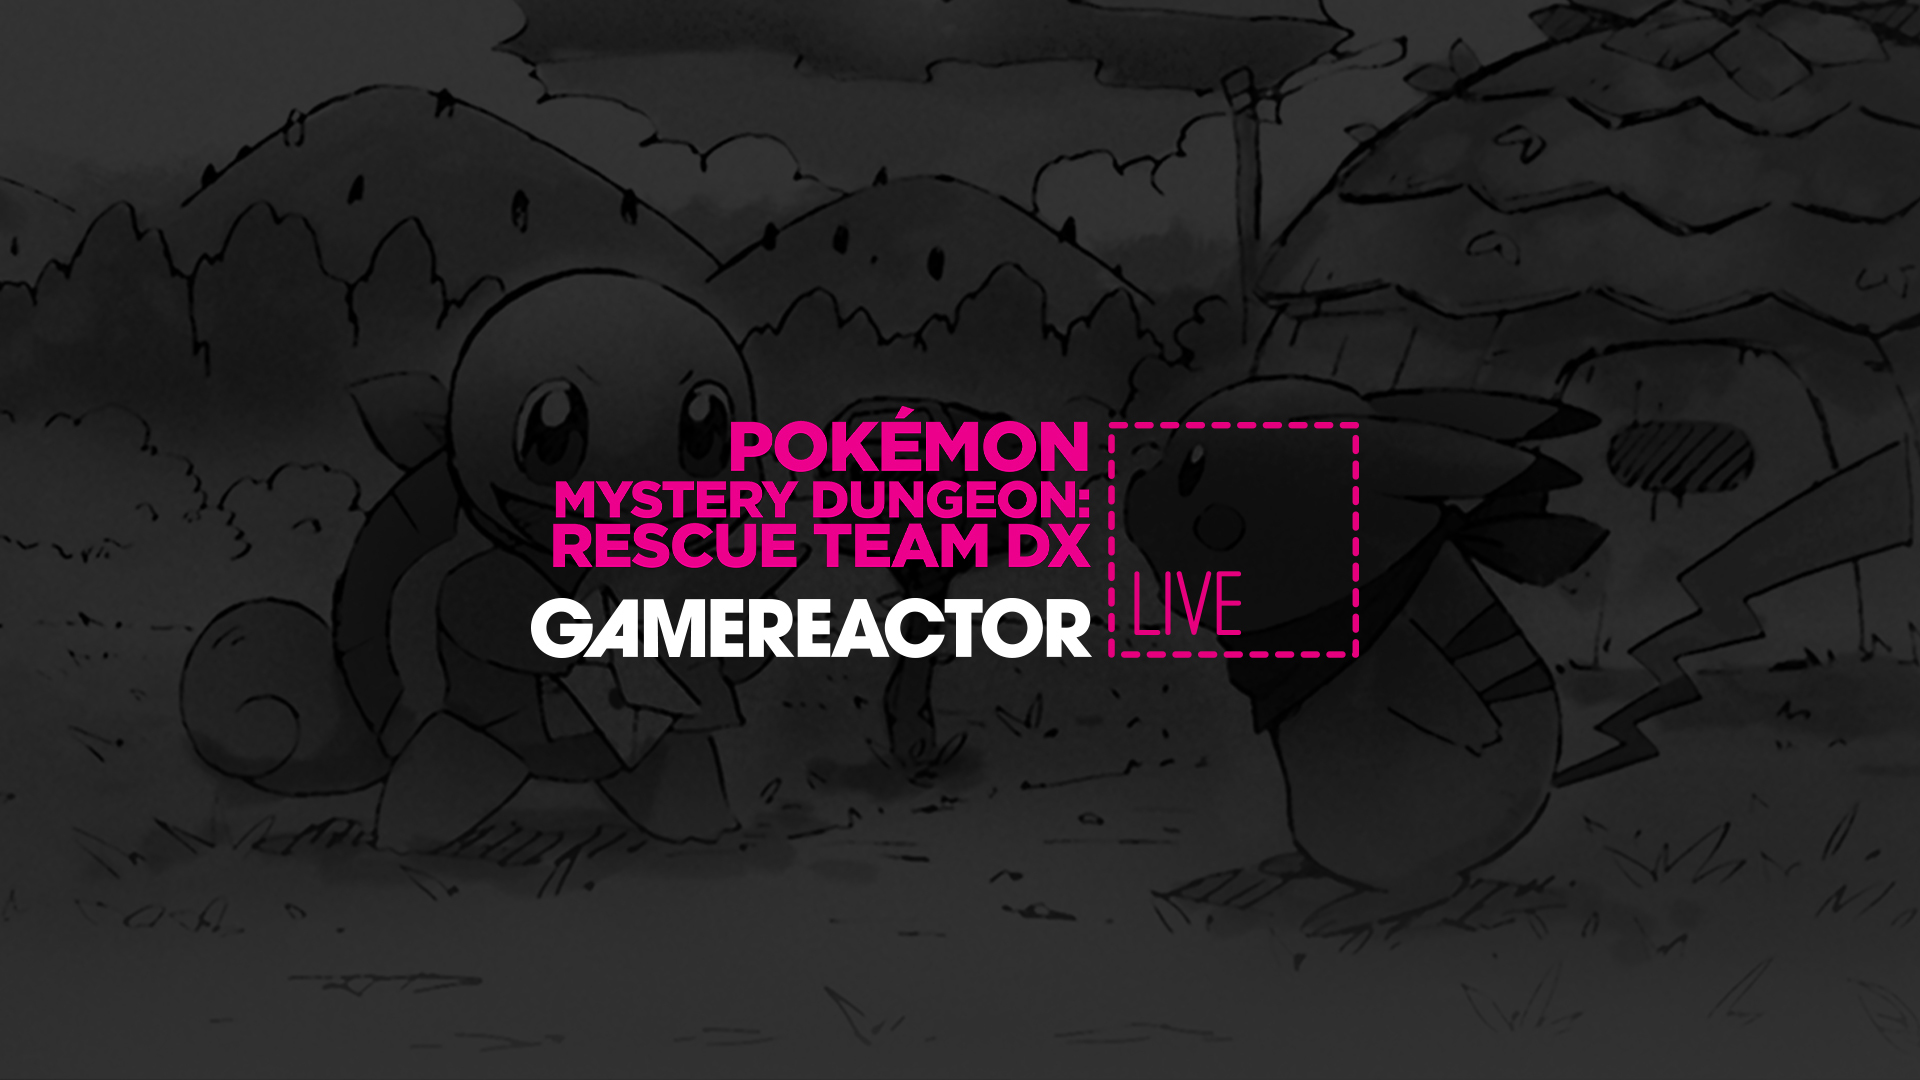 Gamereactor Live: Fickmonsteräventyr i Pokémon Mystery Dungeon